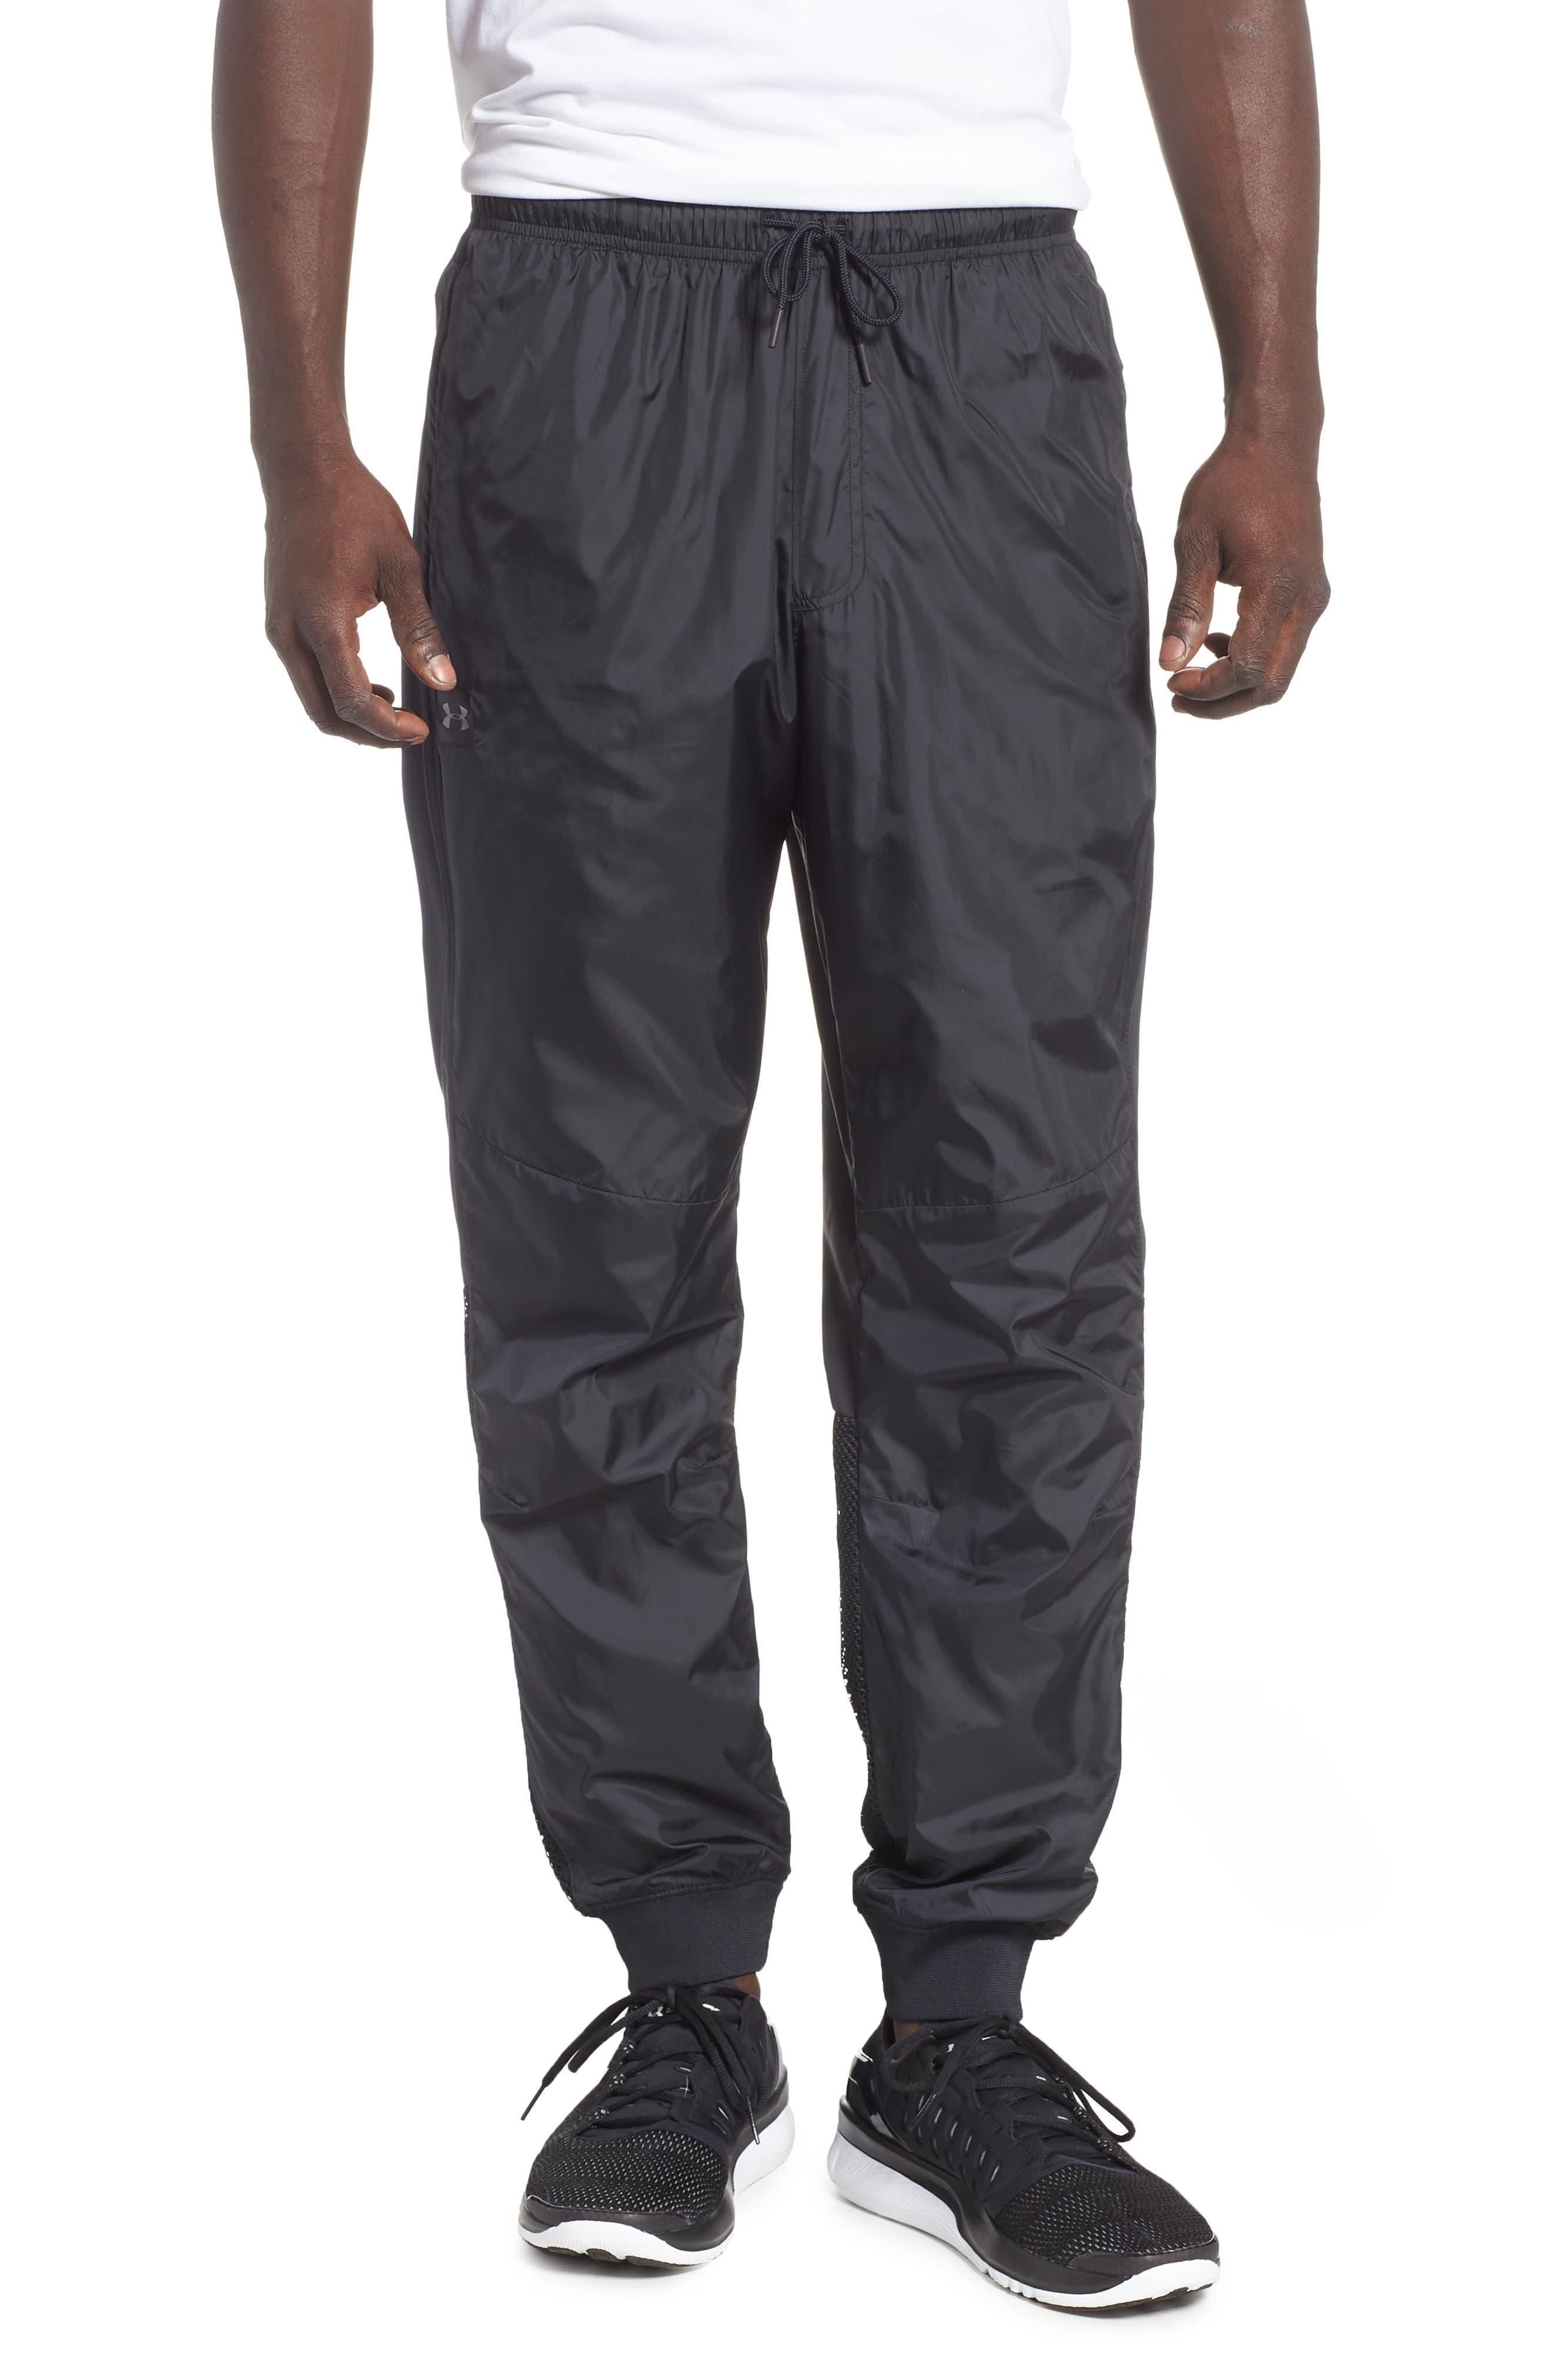 UNDER ARMOUR,                             Sportstyle Wind Pants,                             Main thumbnail 1, color,                             BLACK